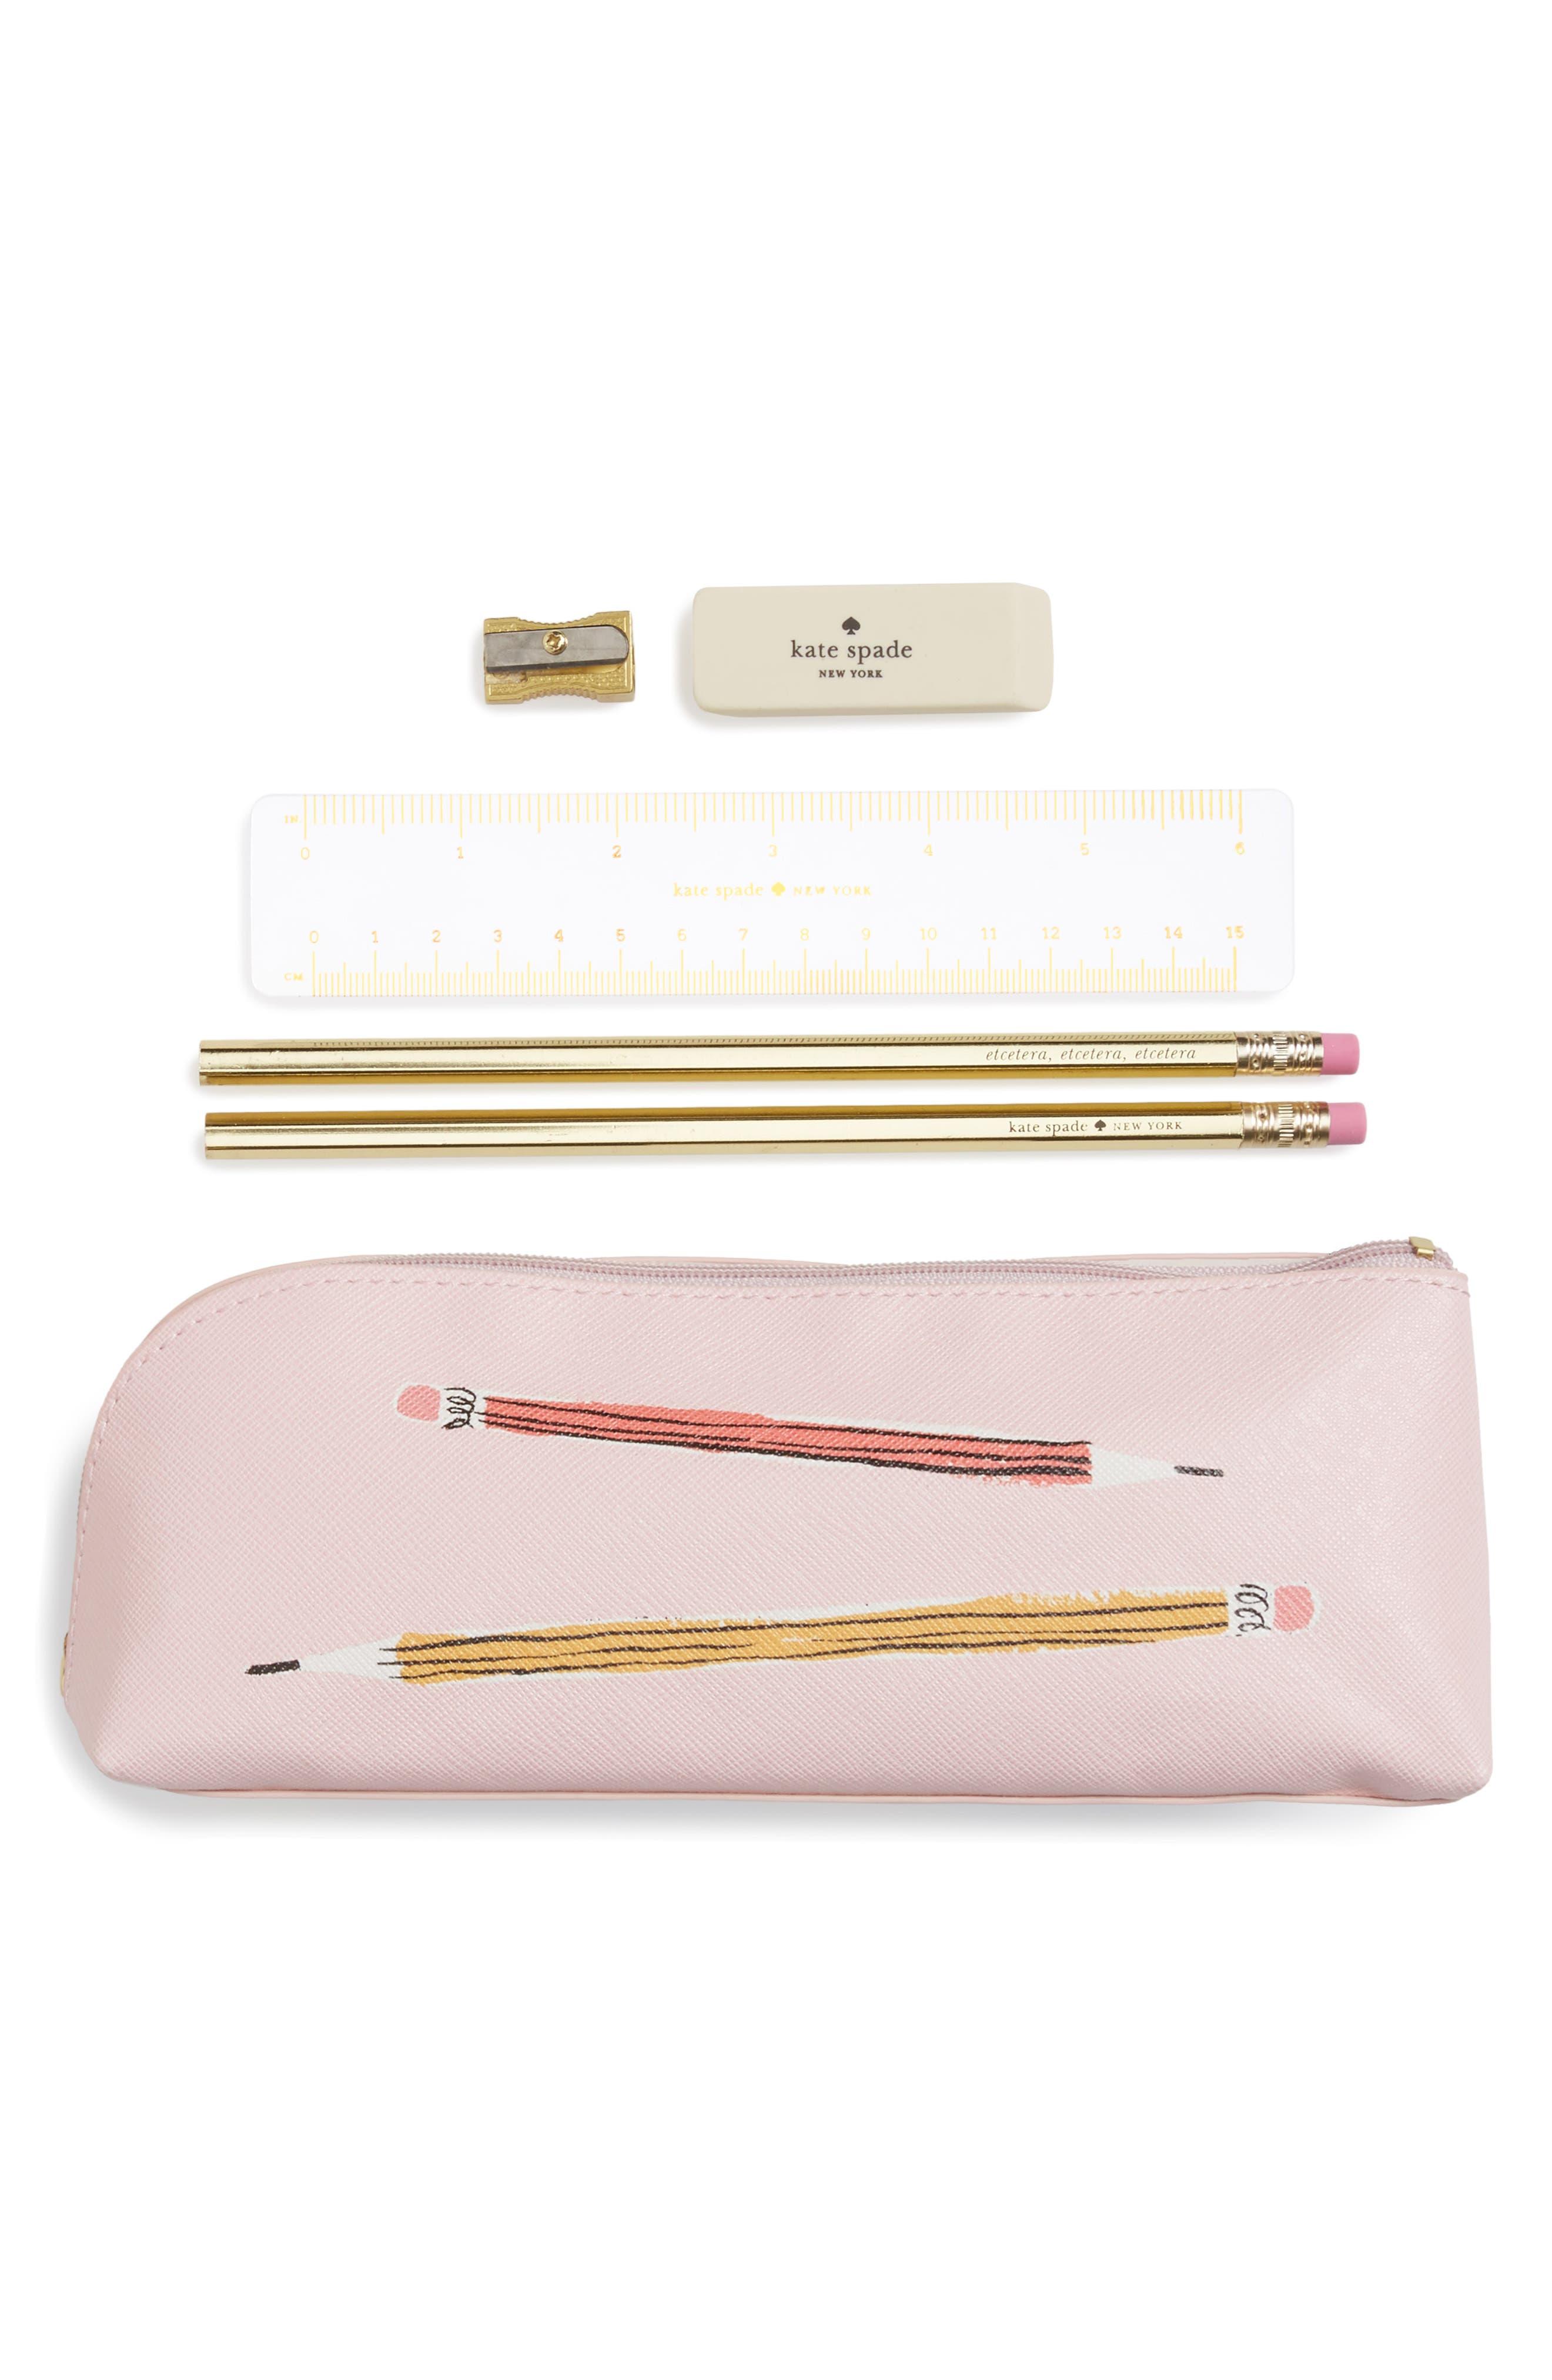 kate spade new york sketch pencil case